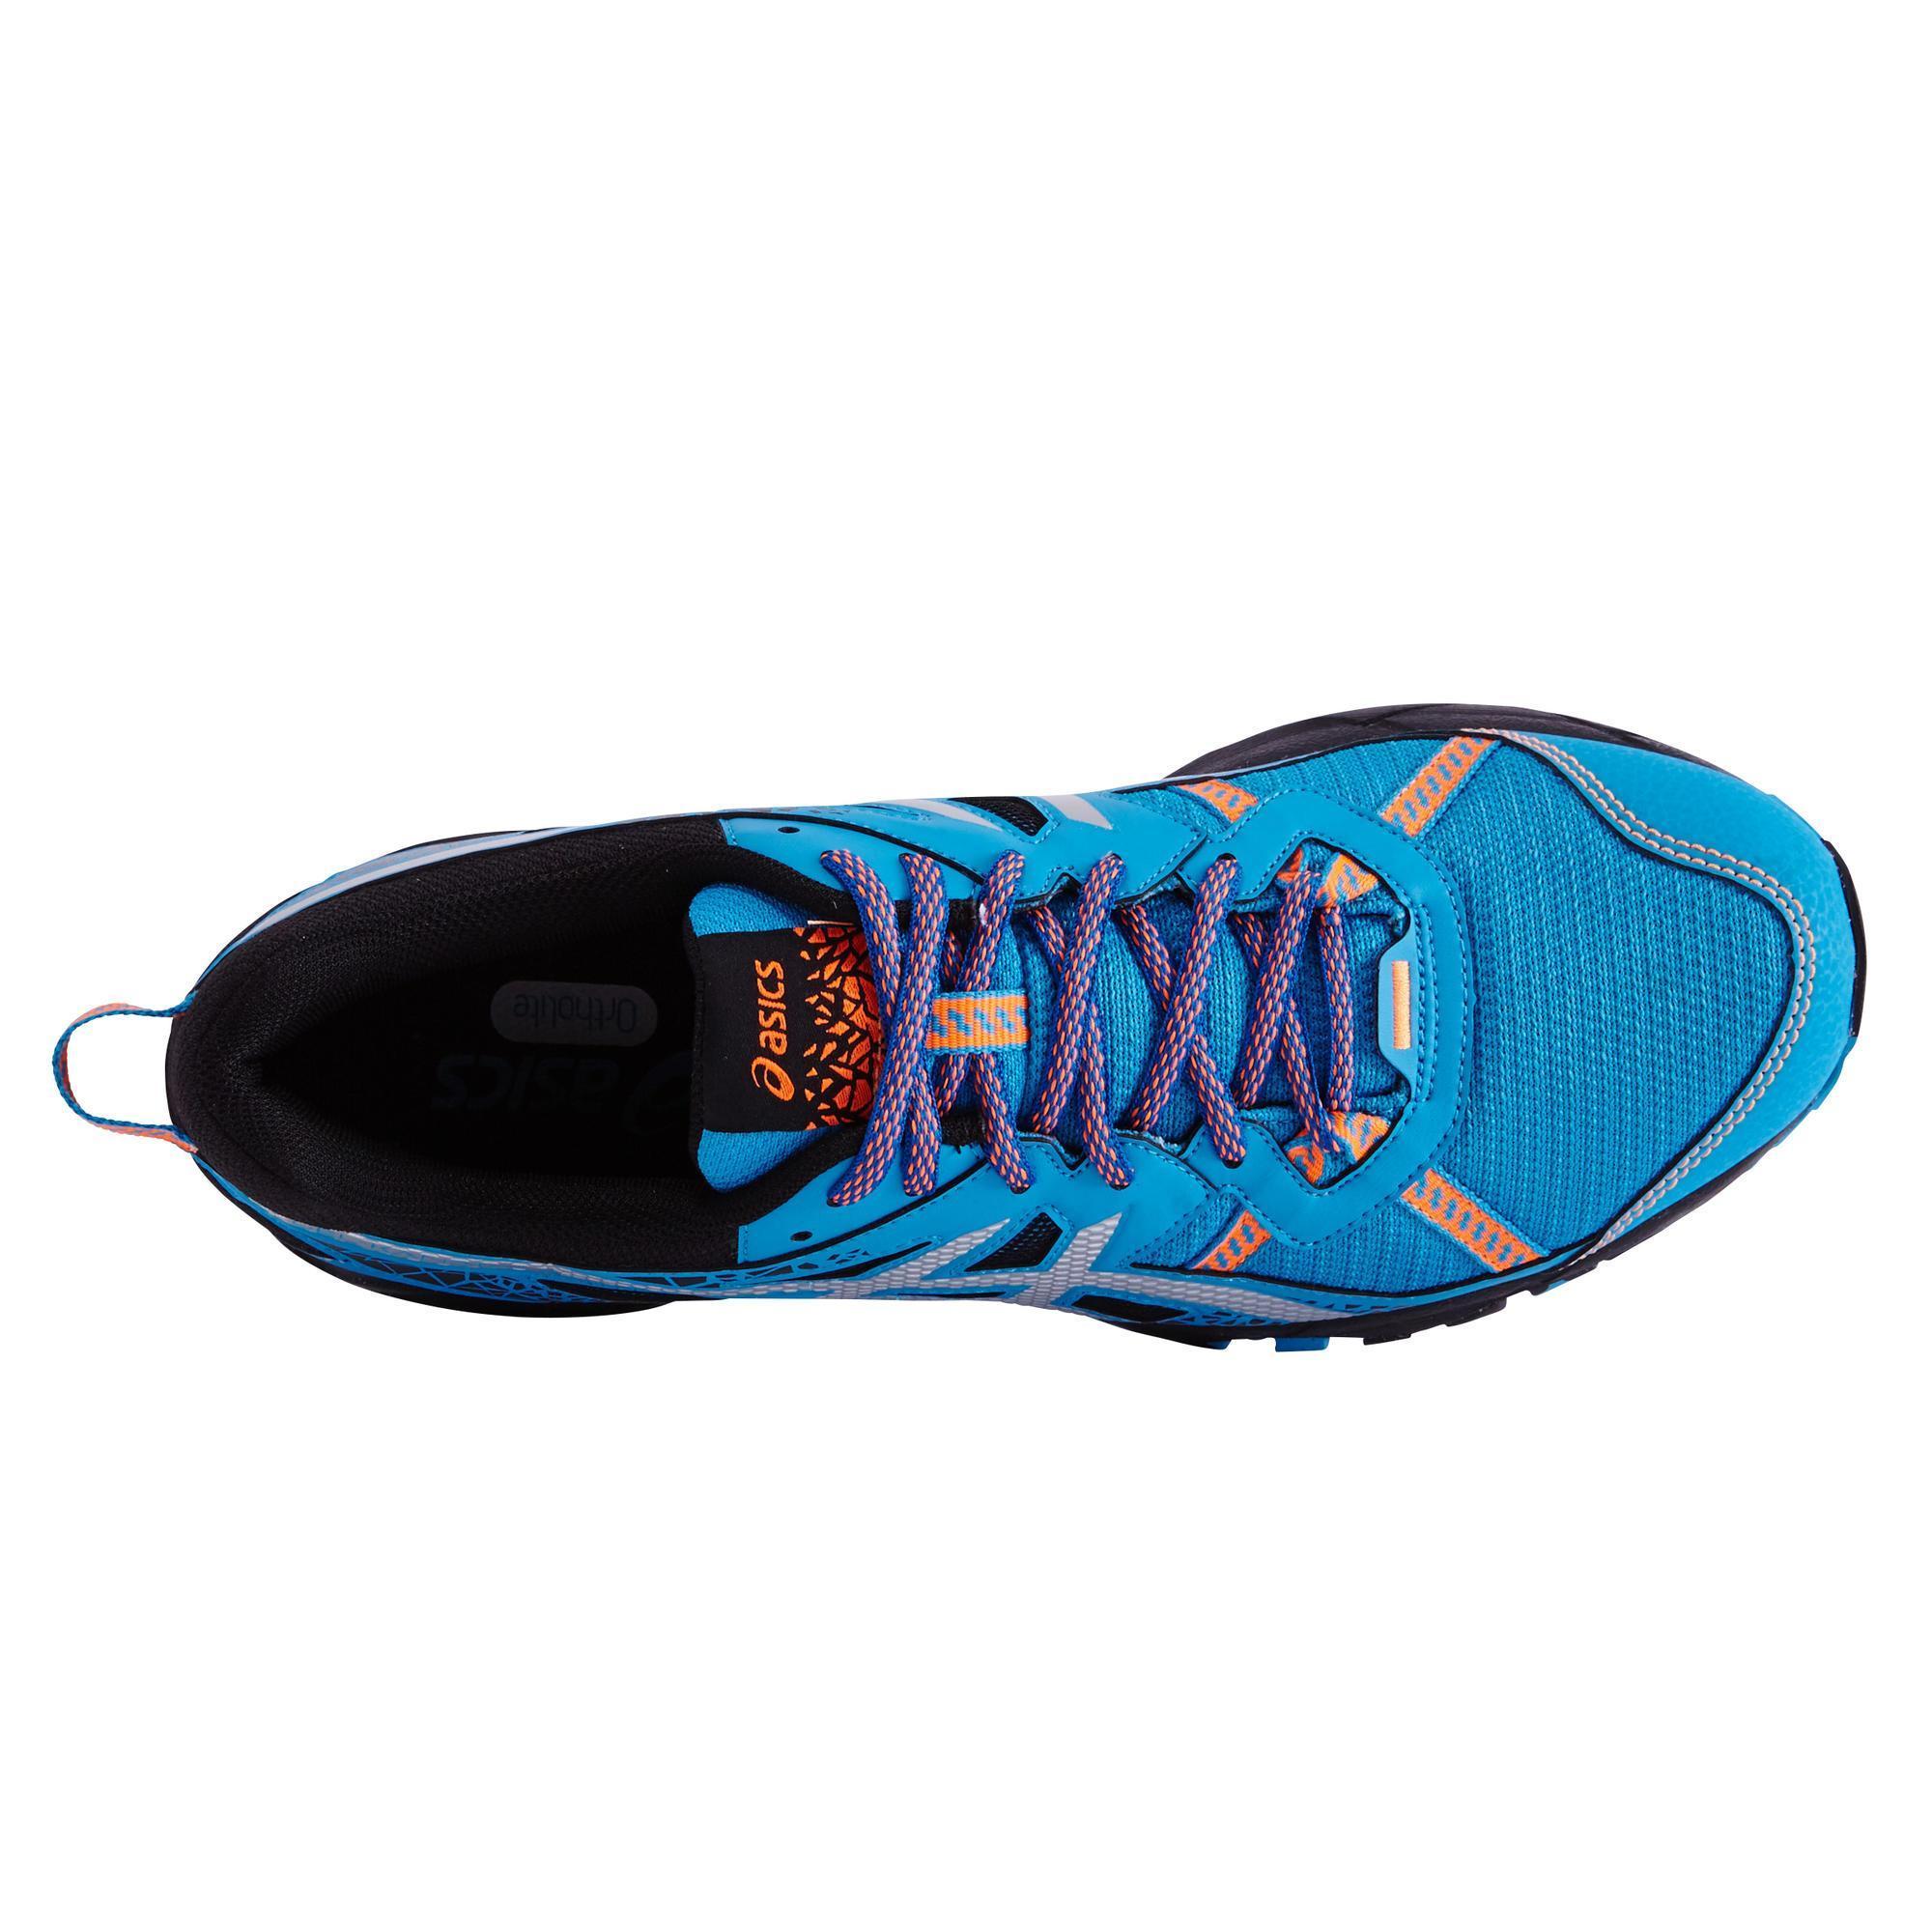 the best attitude 12eac b34ac Trail Bleu 3 Decathlon Kanaku Gel Asics Chaussure Homme FxqBq1